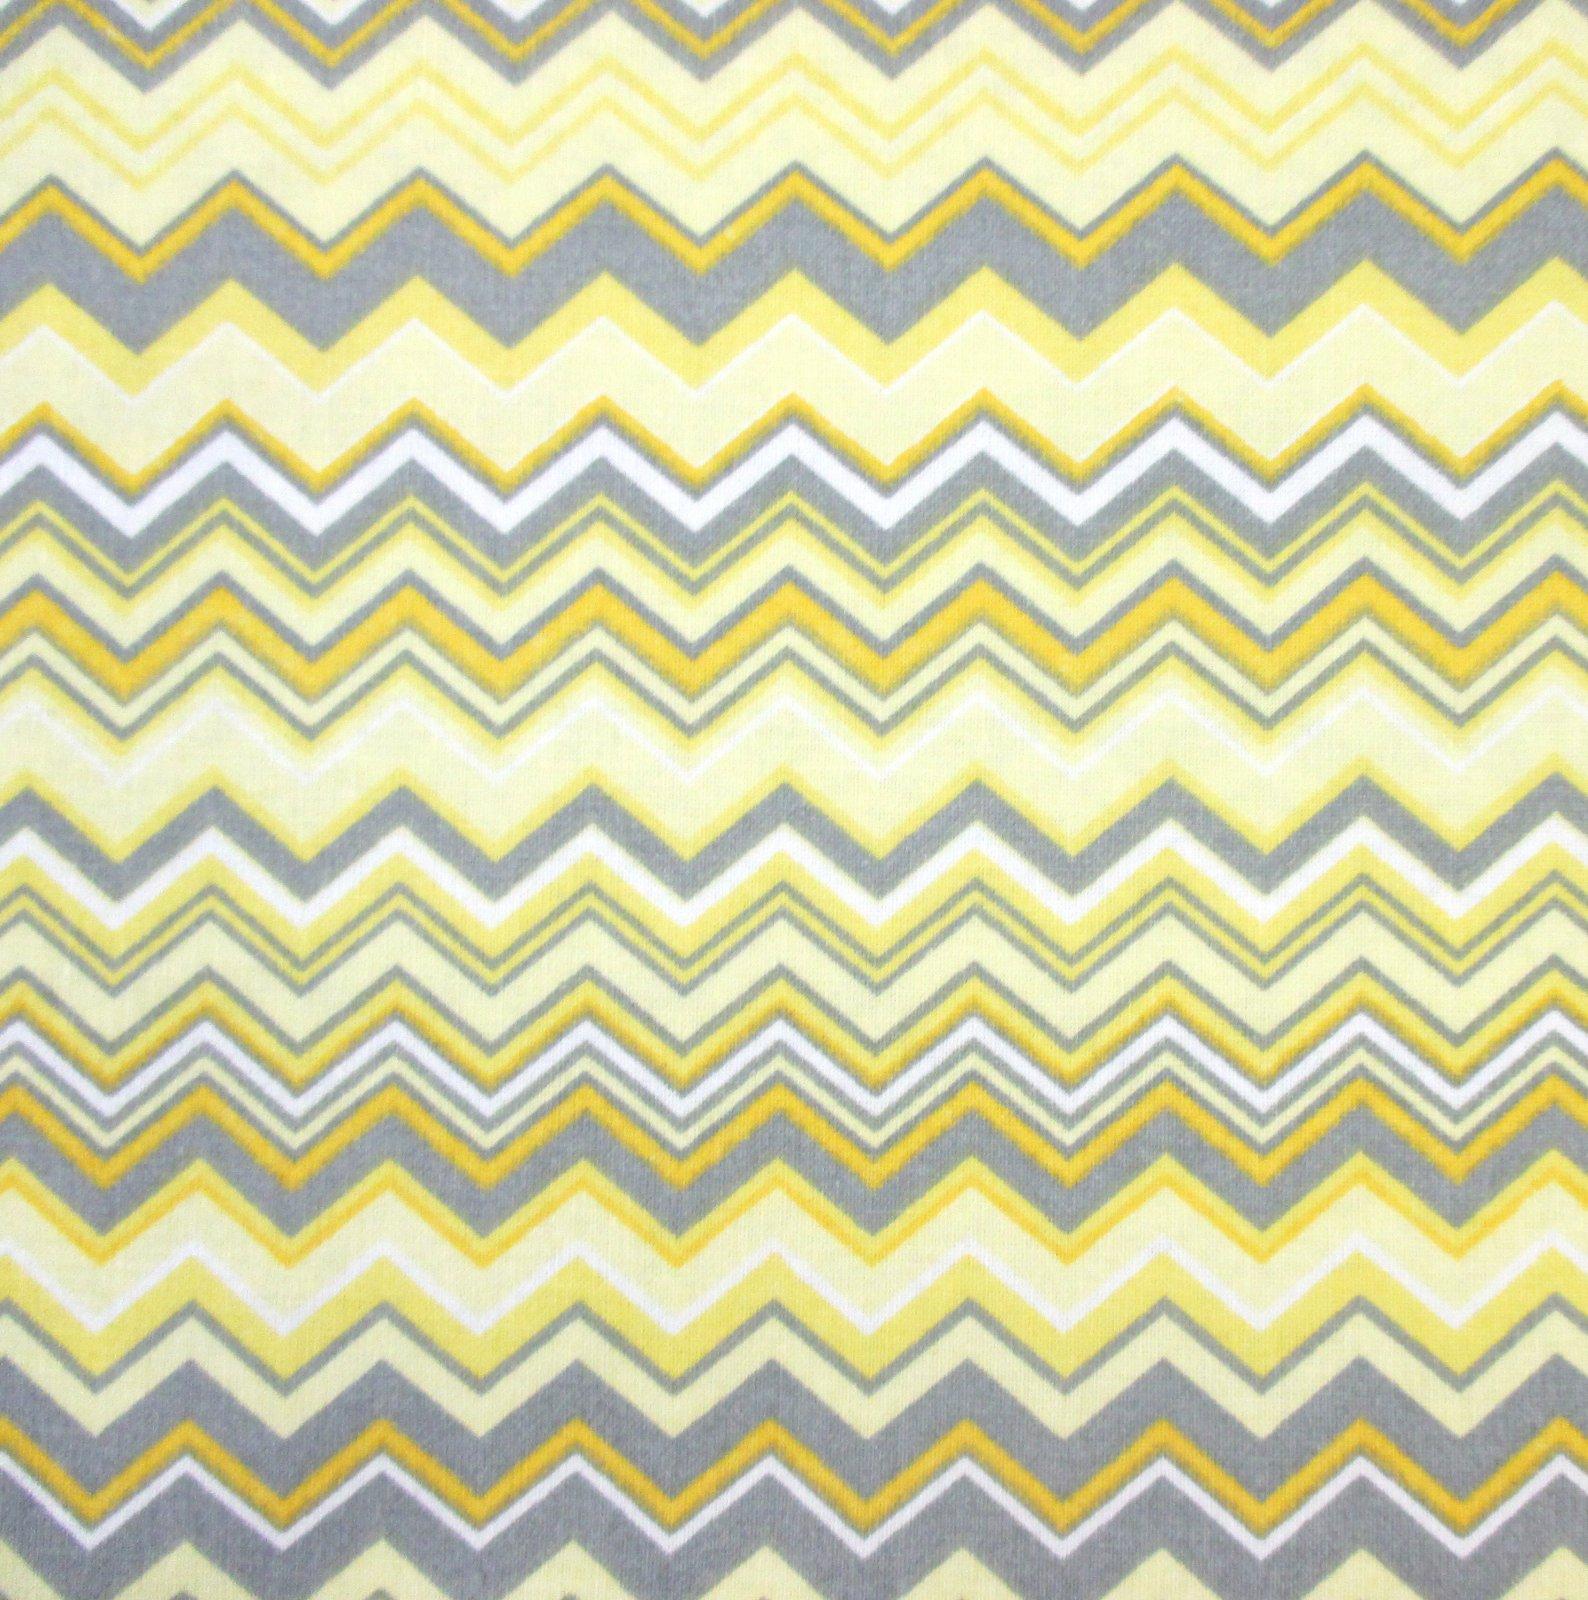 A.E. Nathan - Chevron - Yellow/Gray/White